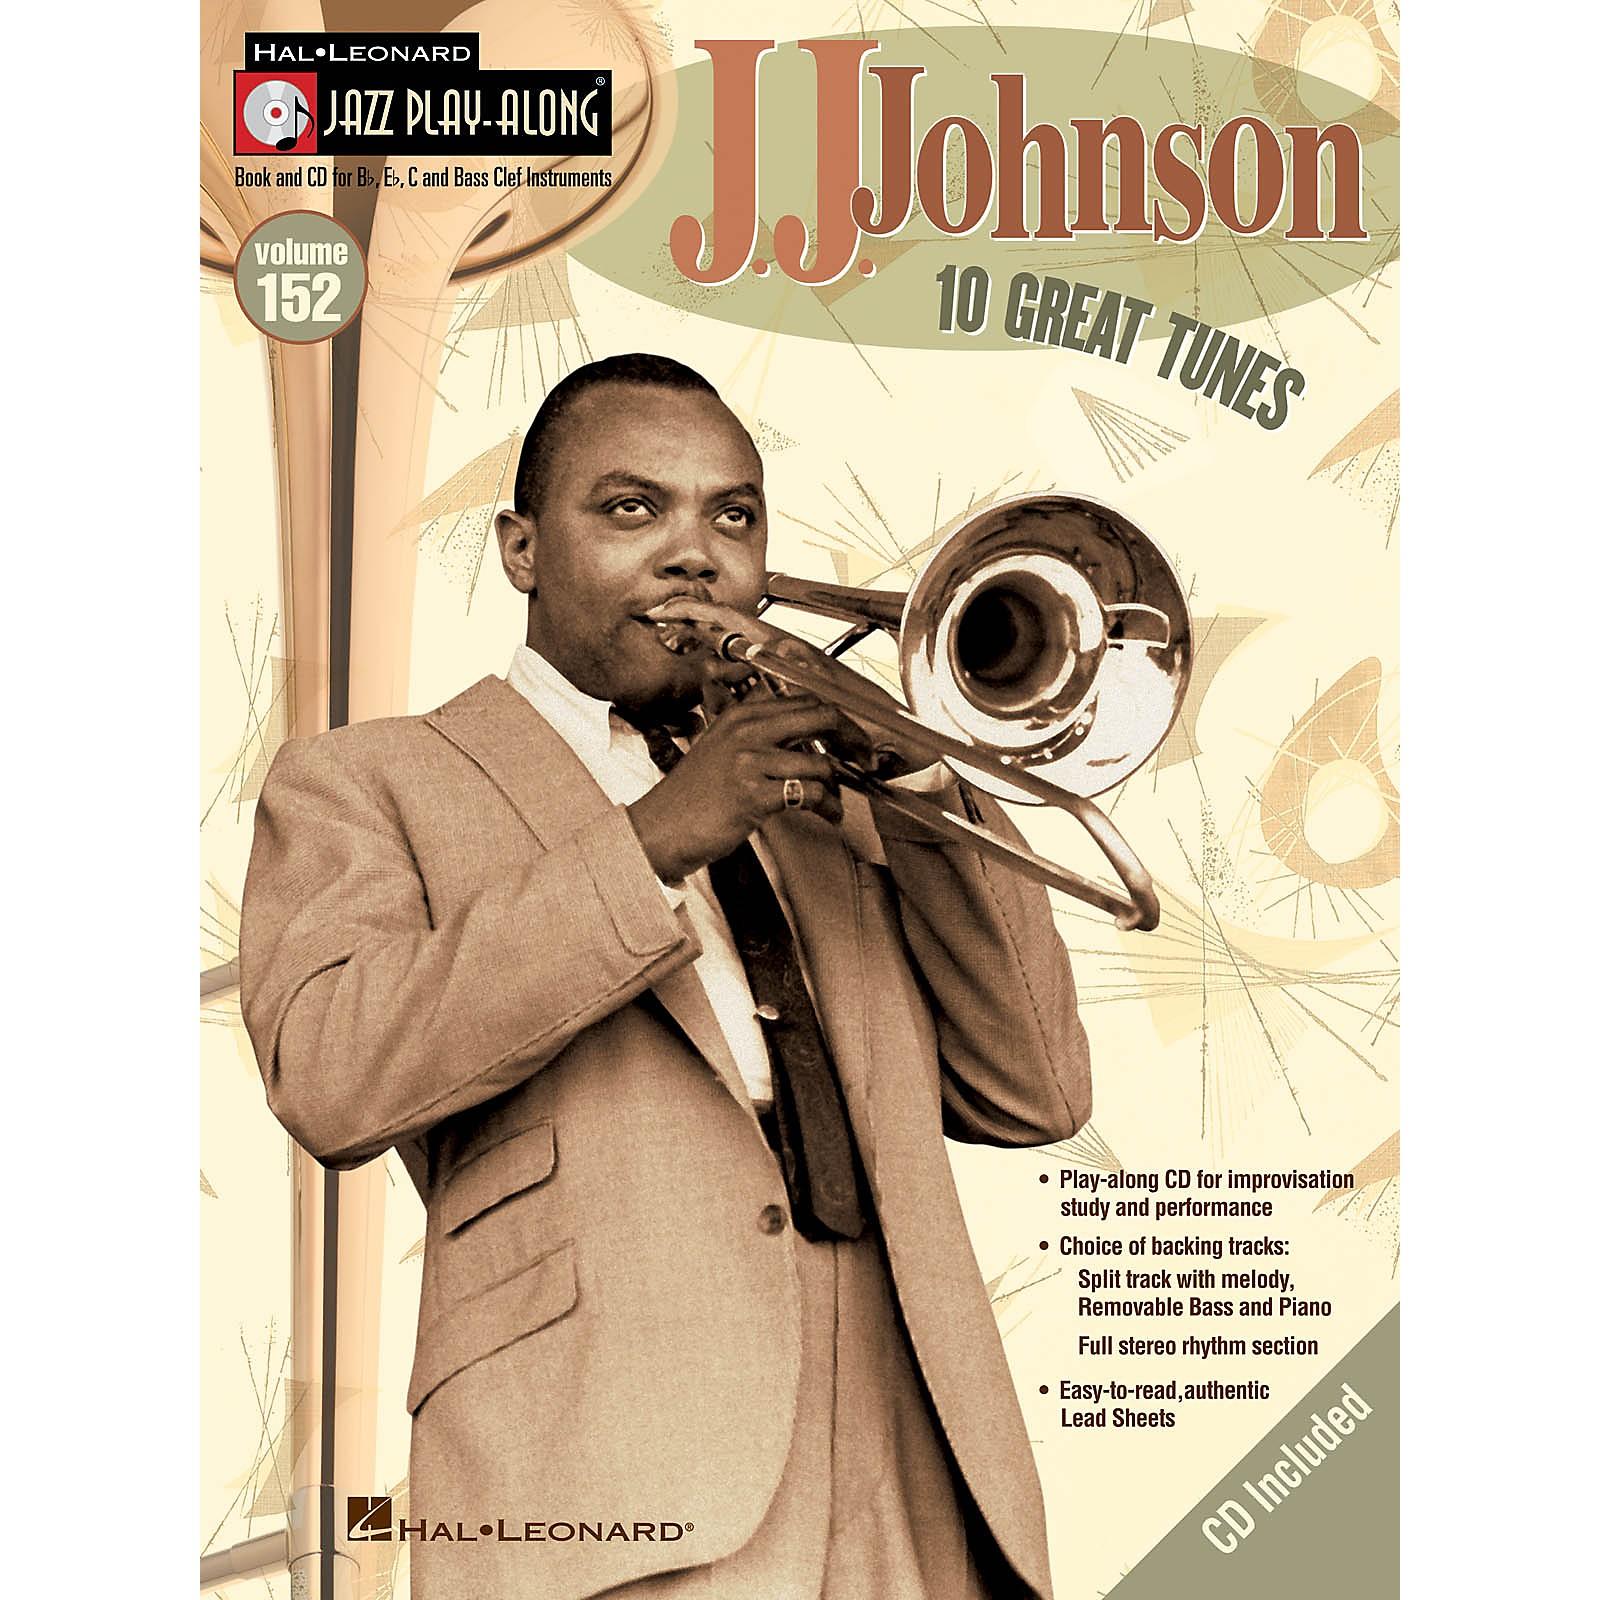 Hal Leonard J.J. Johnson (Jazz Play-Along Volume 152) Jazz Play Along Series Softcover with CD by J.J. Johnson